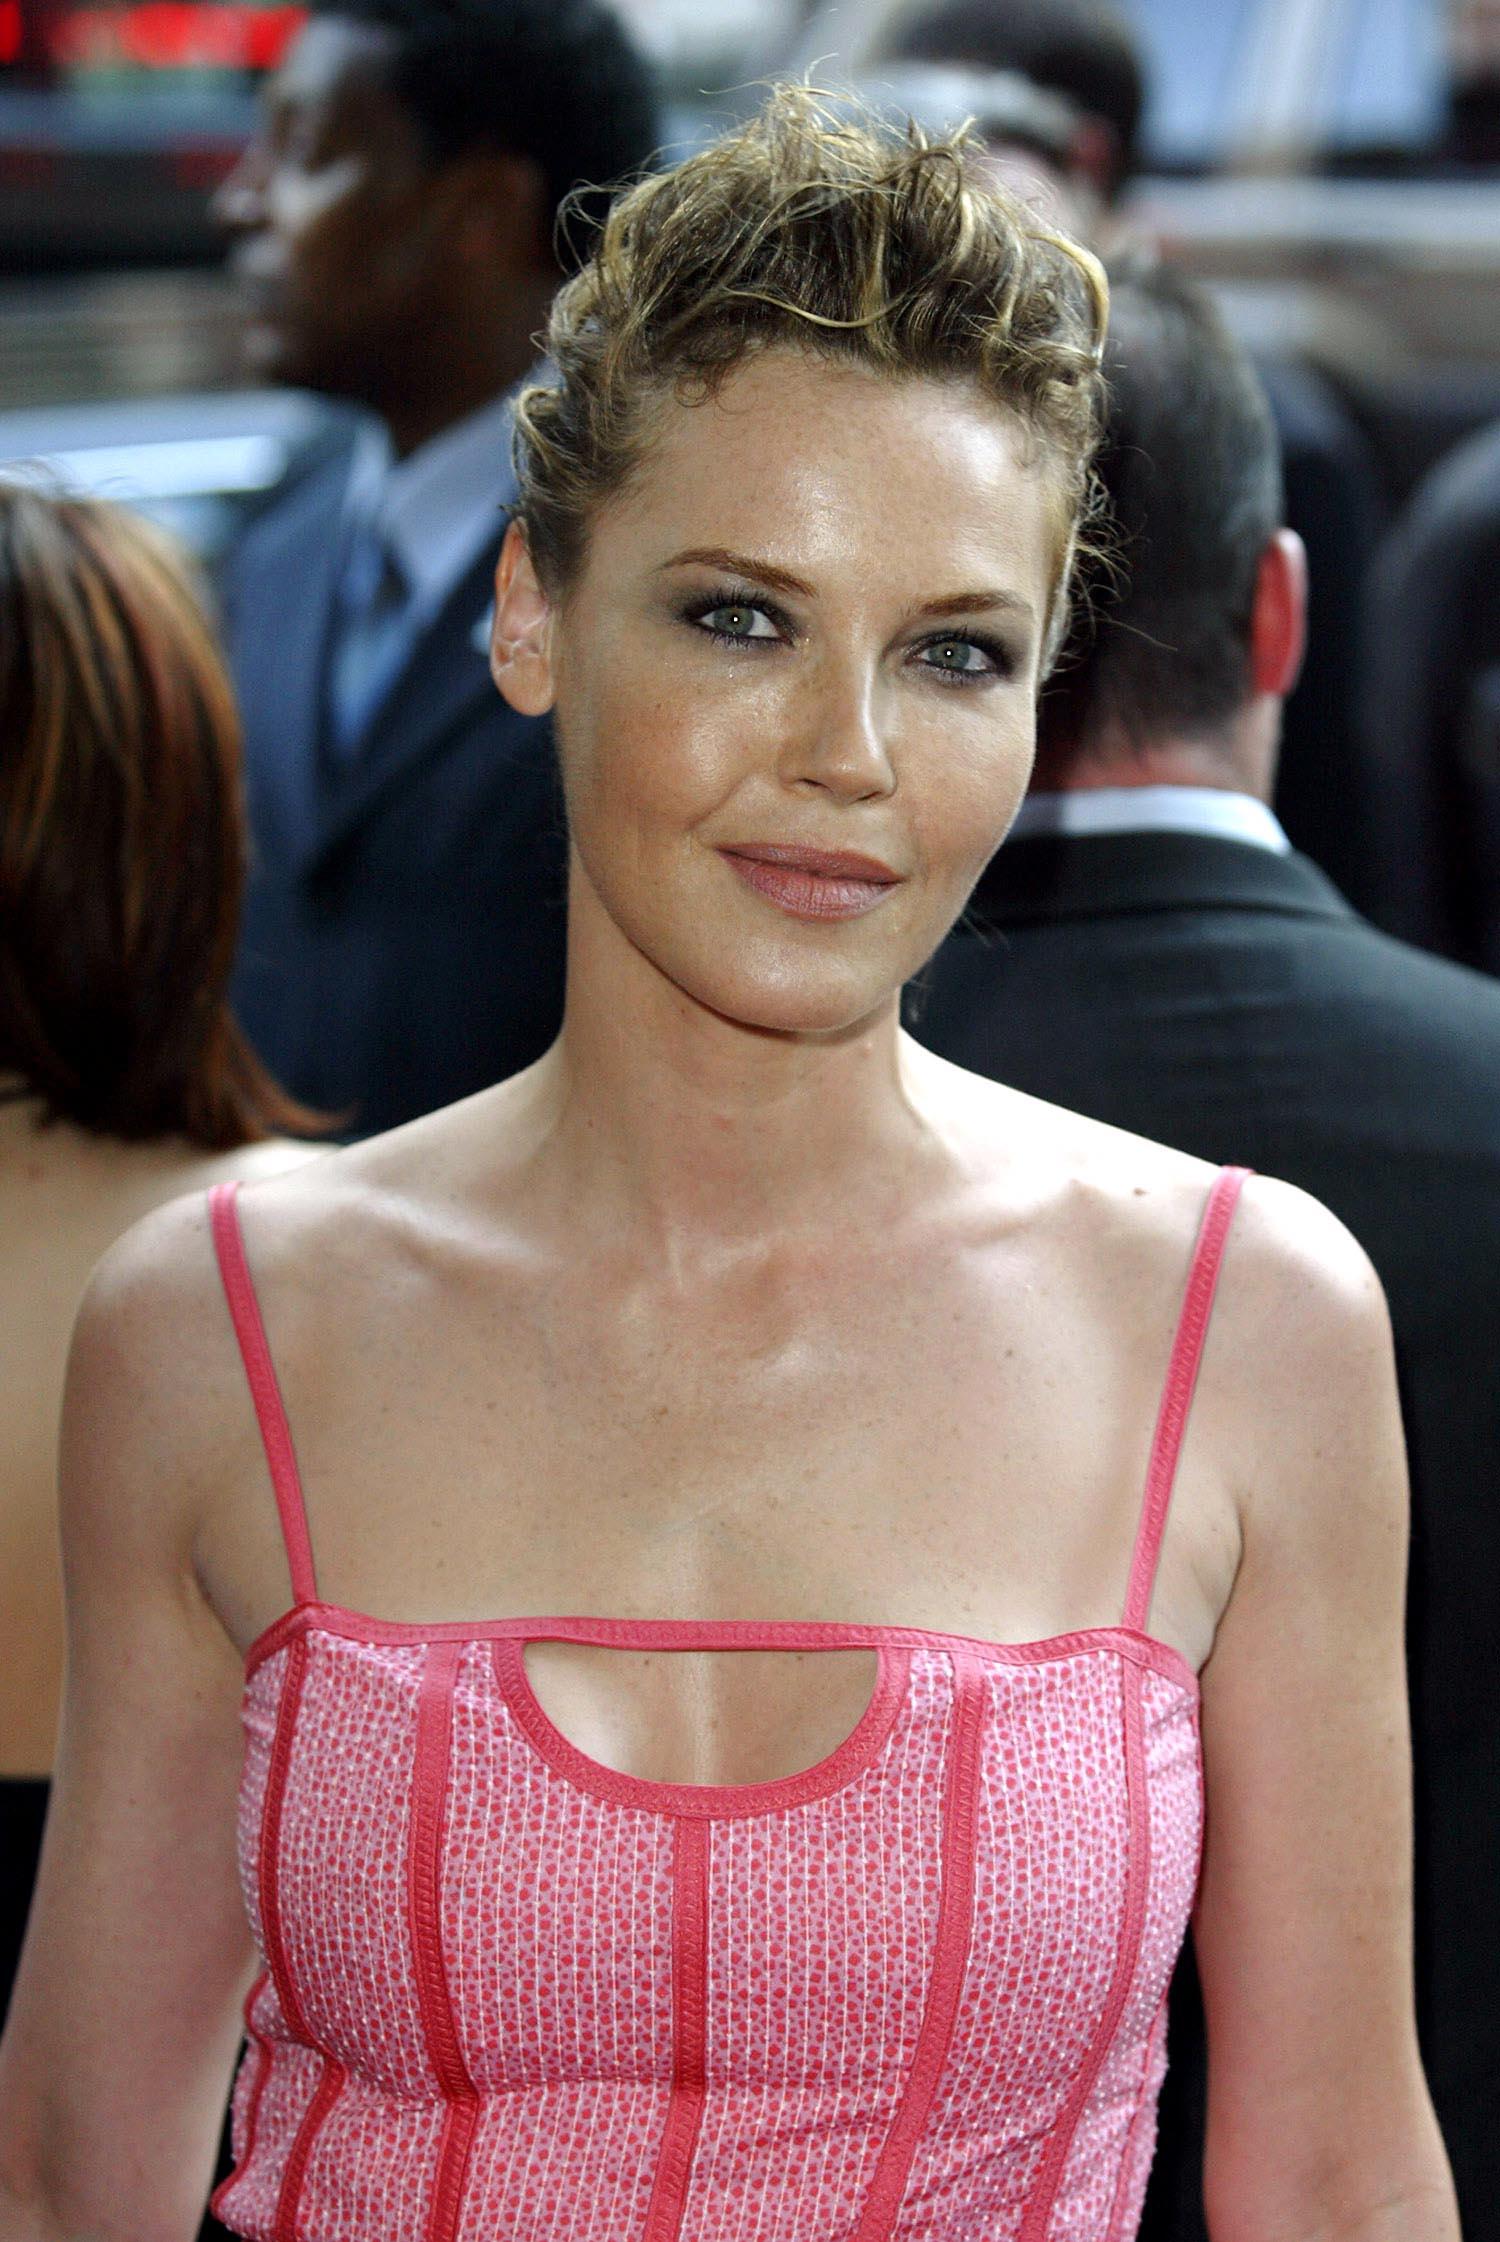 Scarlett johansson 2014 all full hot scenes latest - 1 part 4